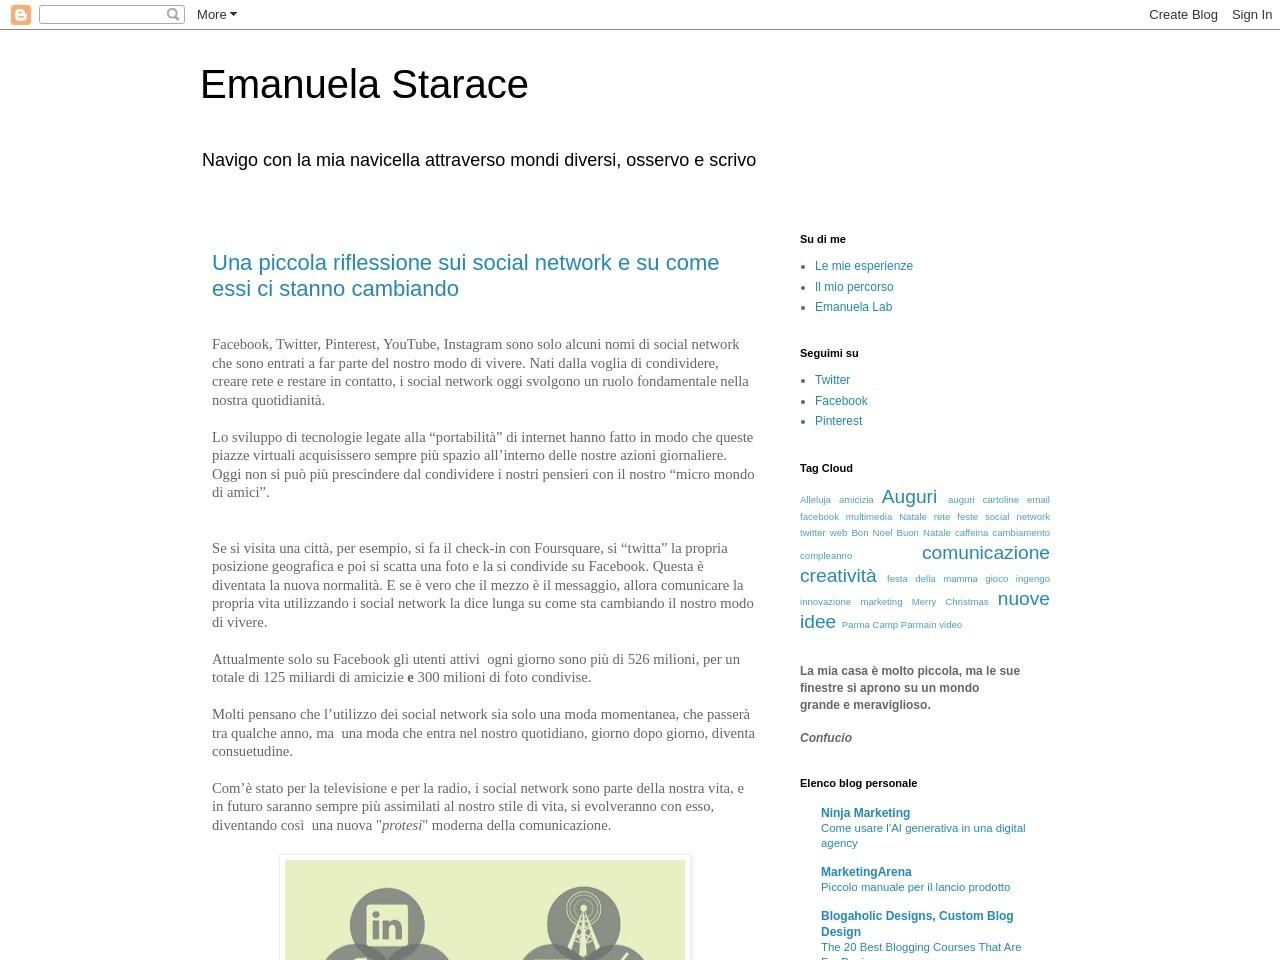 emanuela-starace